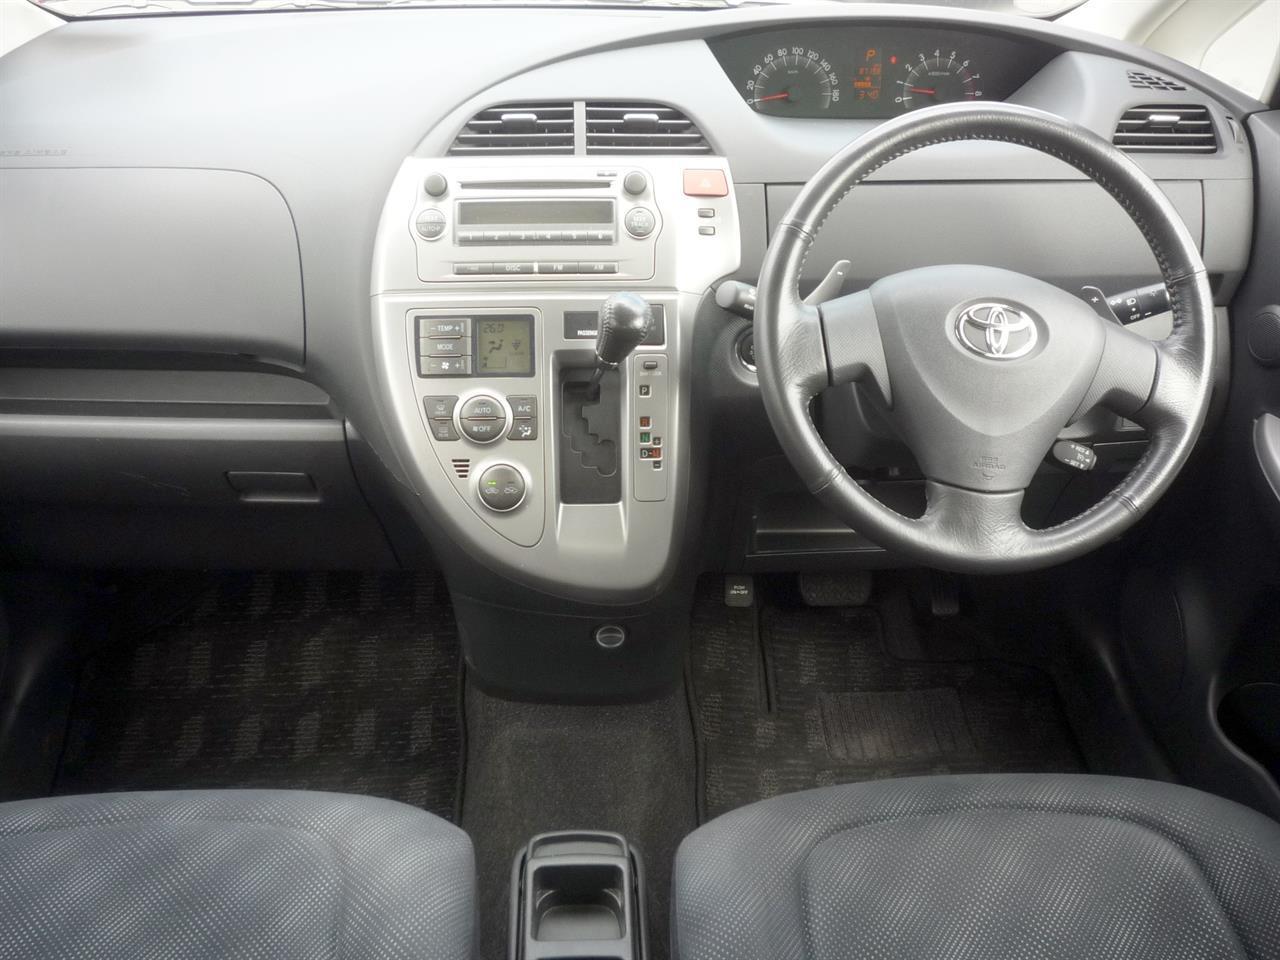 image-2, 2006 Toyota Ractis at Dunedin